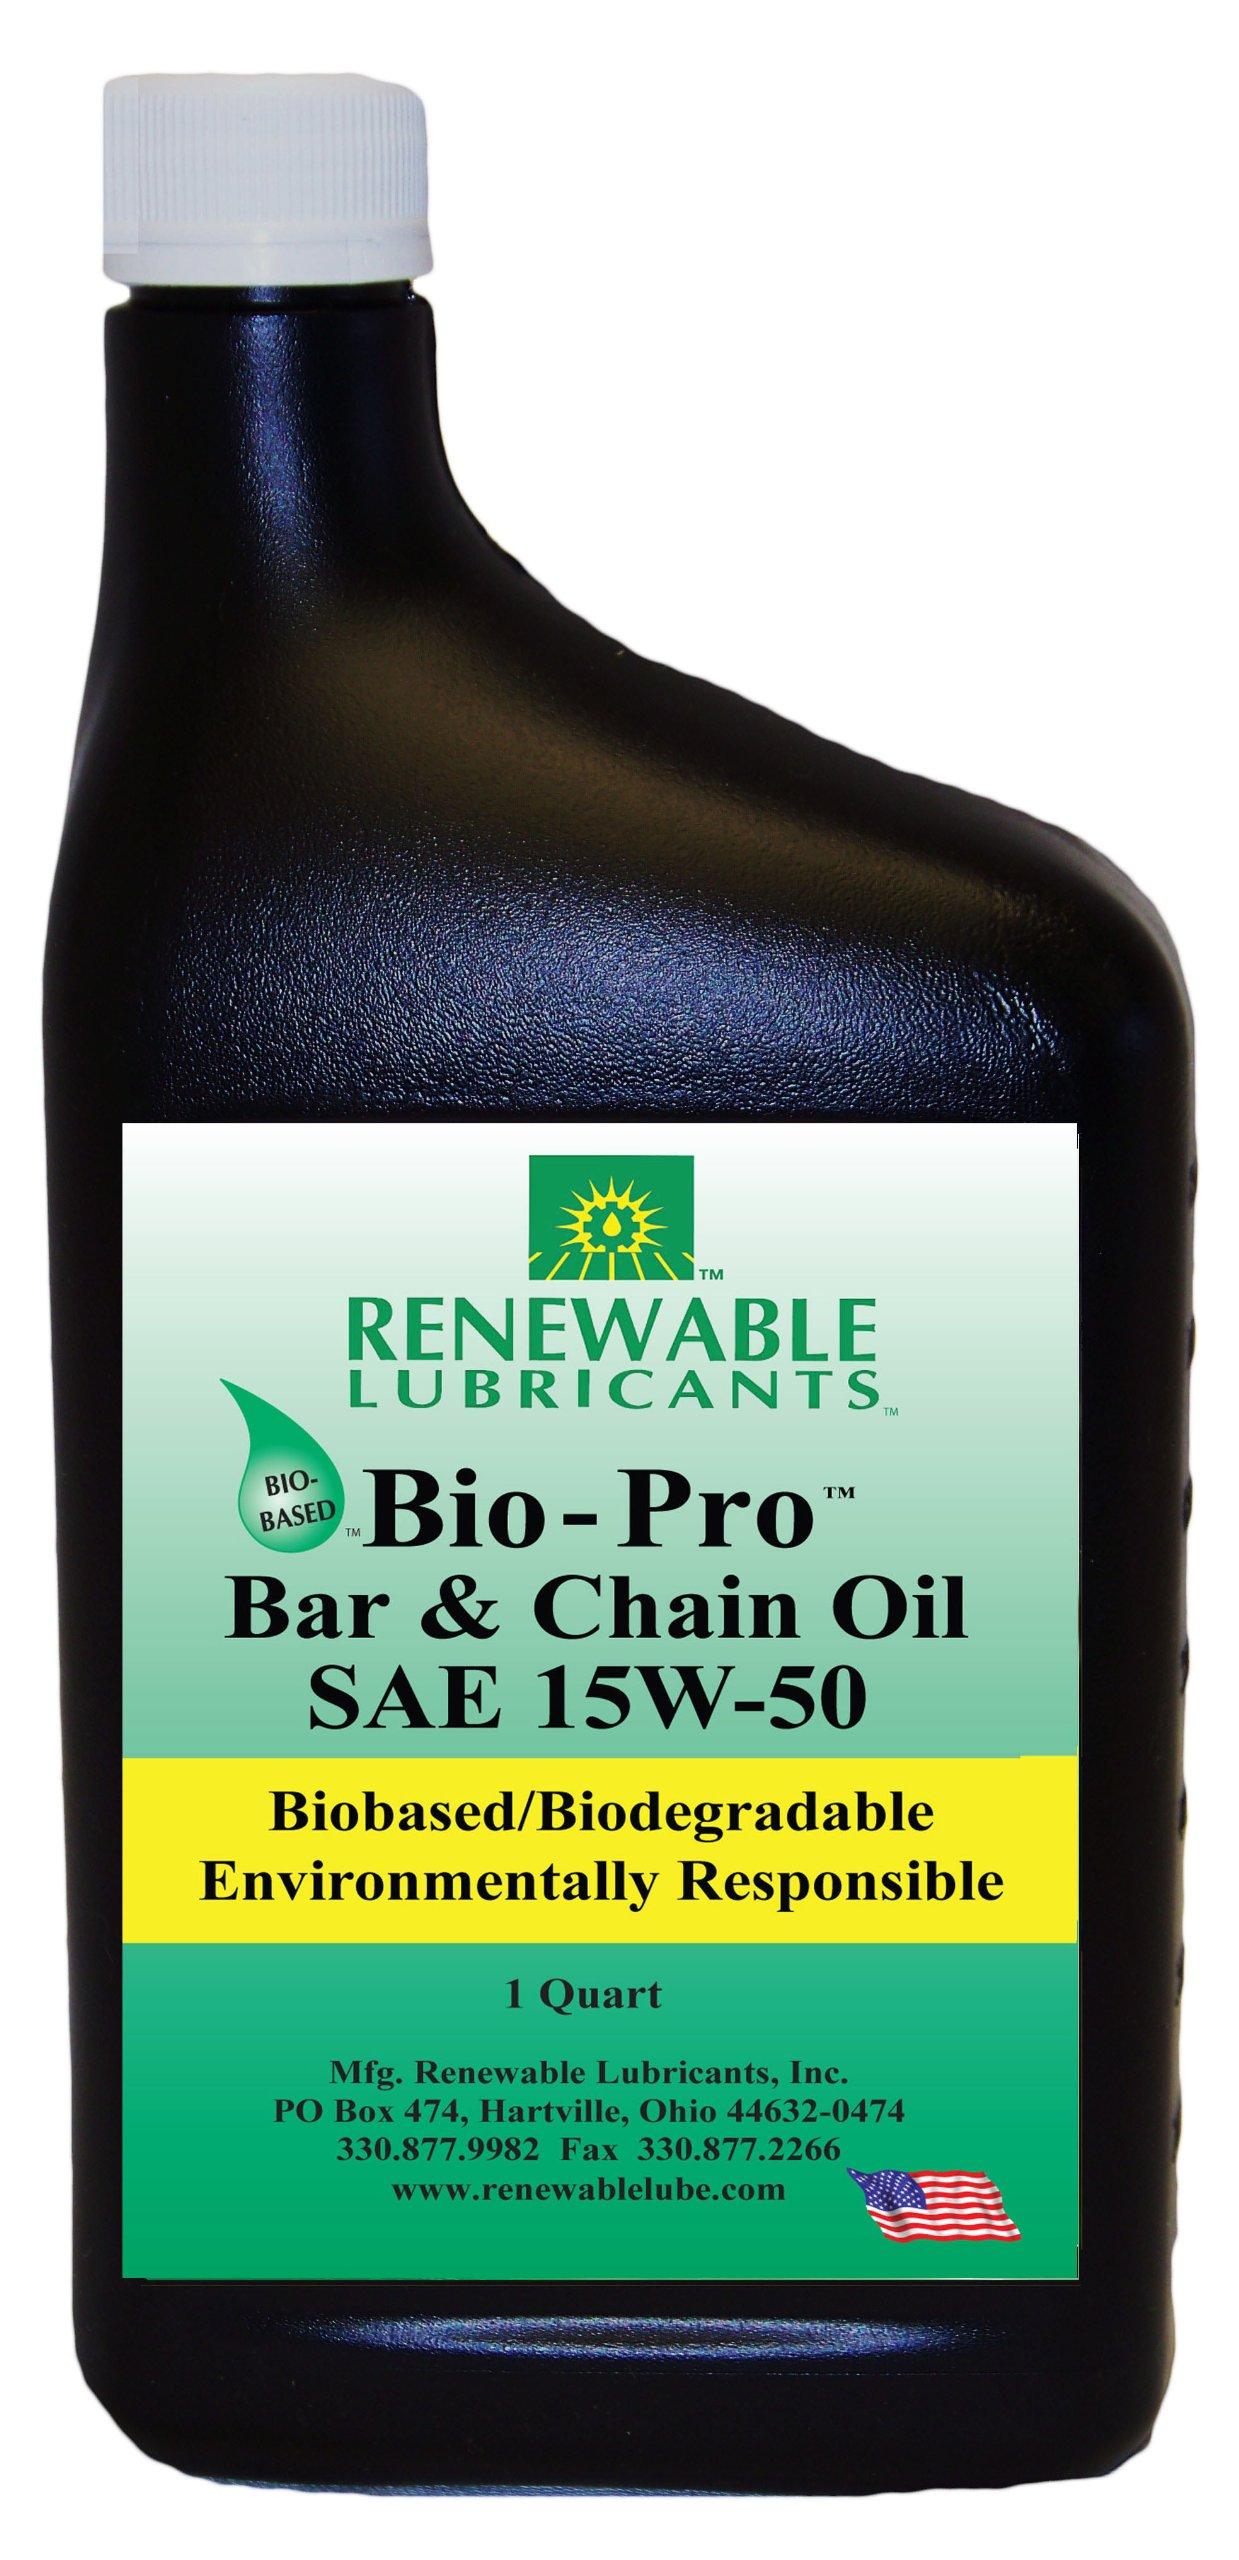 Renewable Lubricants Bio-Pro Bar and Chain Lubricant, 1 qt Bottle